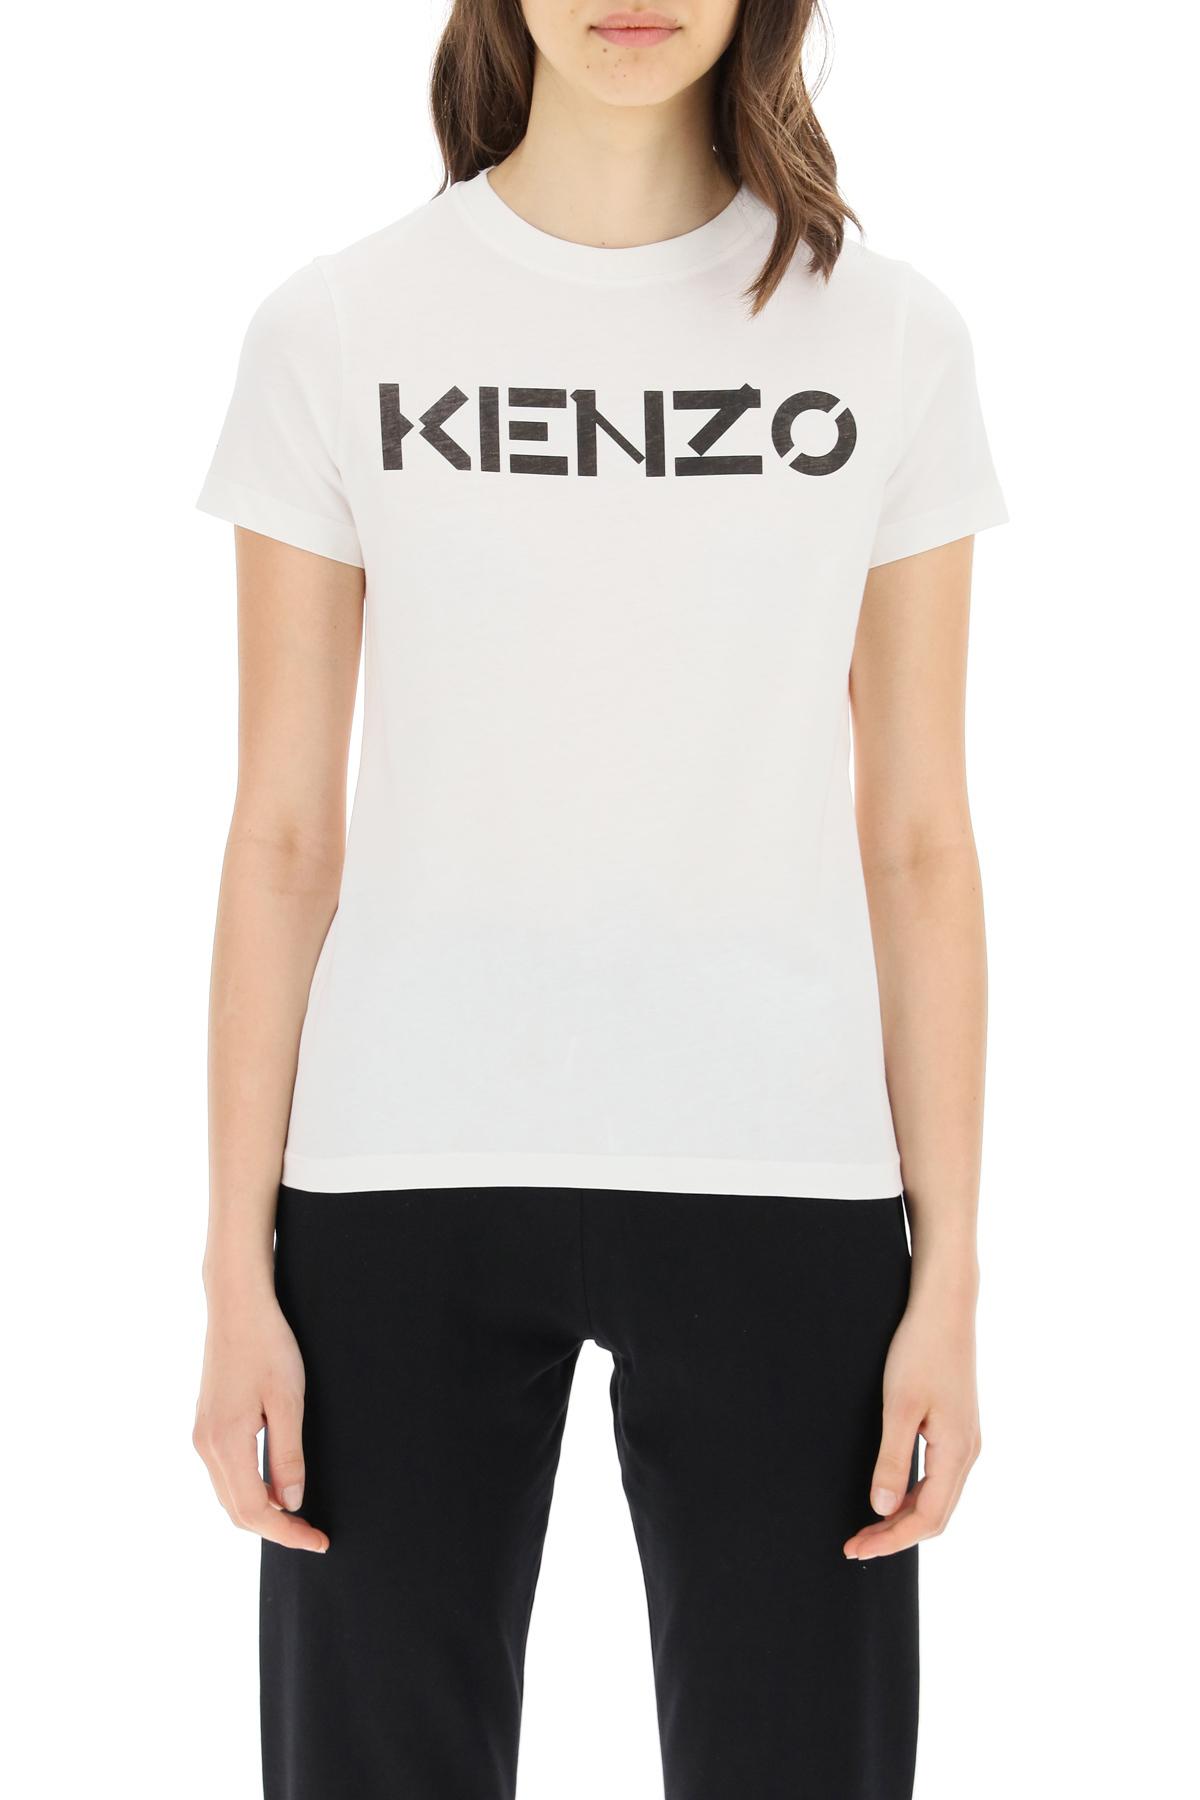 Kenzo t-shirt con stampa logo